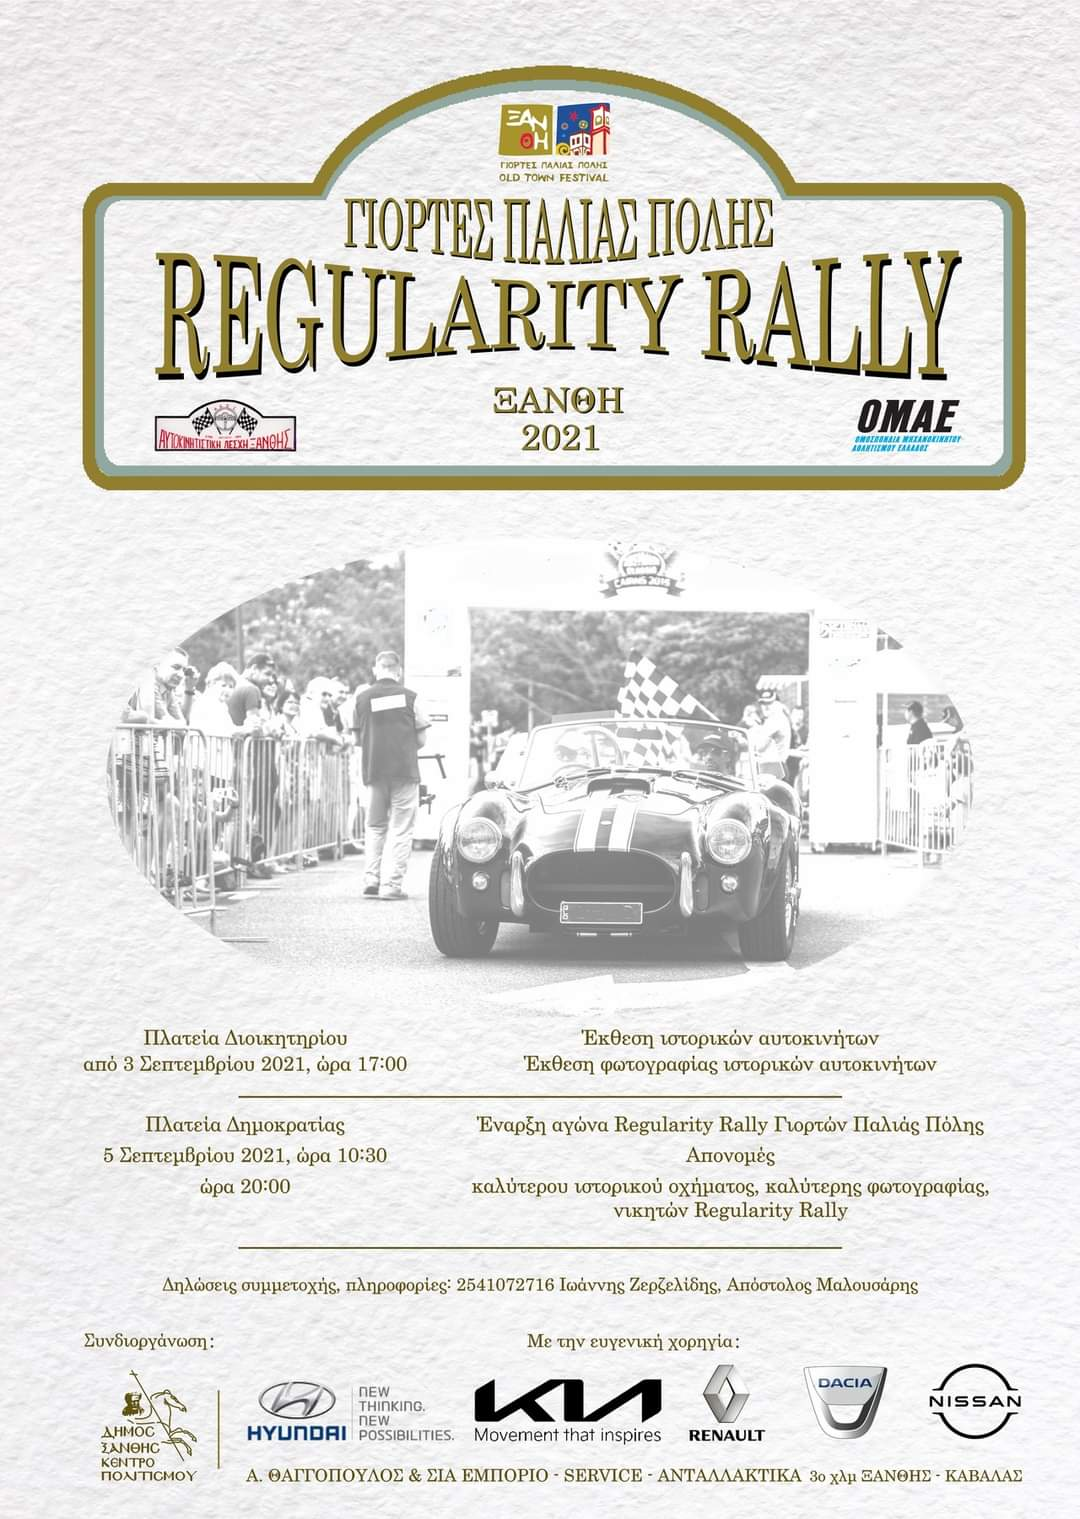 Regularity Rally Γιορτές παλιάς πόλης Ξάνθης 2021